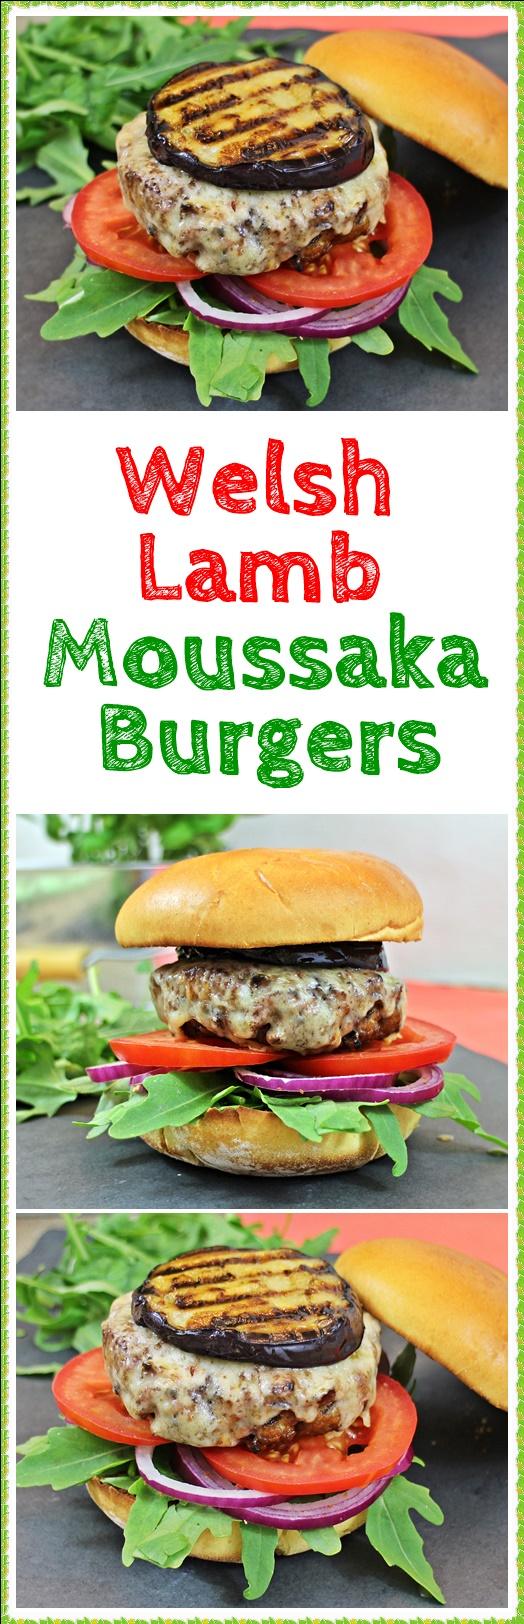 Welsh Lamb Moussaka Burgers - Fab Food 4 All